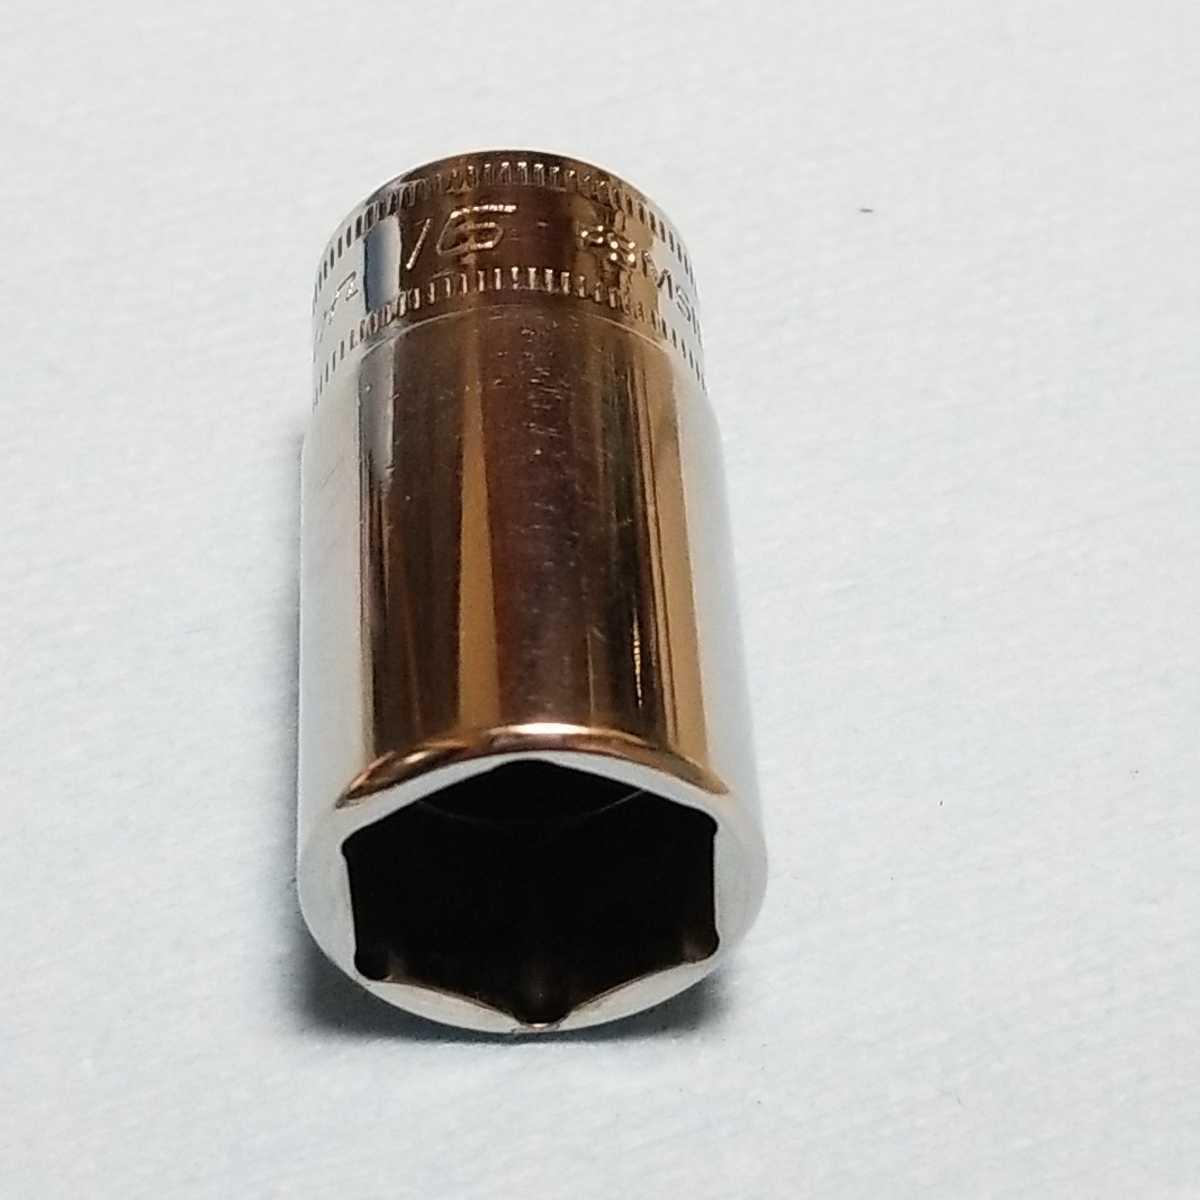 16mm 3/8 セミディープ スナップオン FSMS16 (6角) 中古品 美品 保管品 SNAPON SNAP-ON セミディープソケット ソケット 送料無料 _画像1